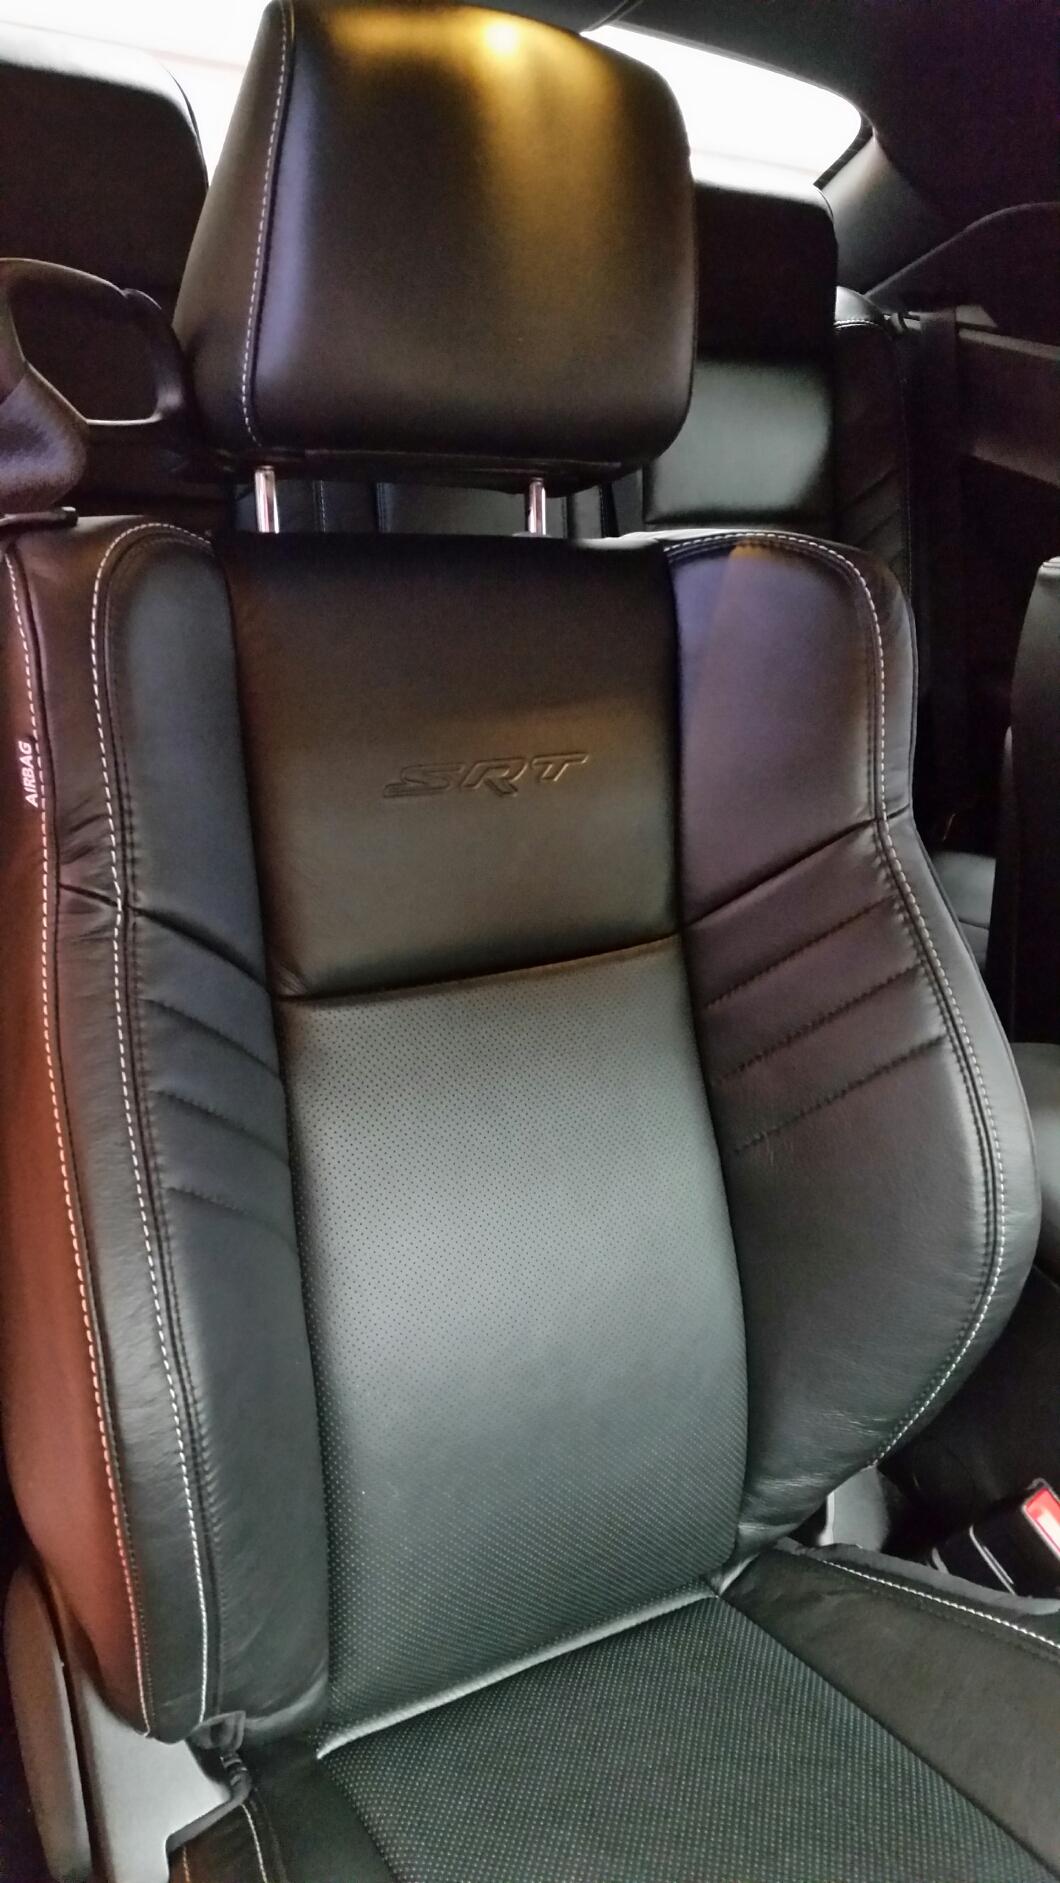 vehicle challenger srt hellcat 2014 11 27 033633jpg - 2015 Dodge Challenger Srt Hellcat Sepia Laguna Leather